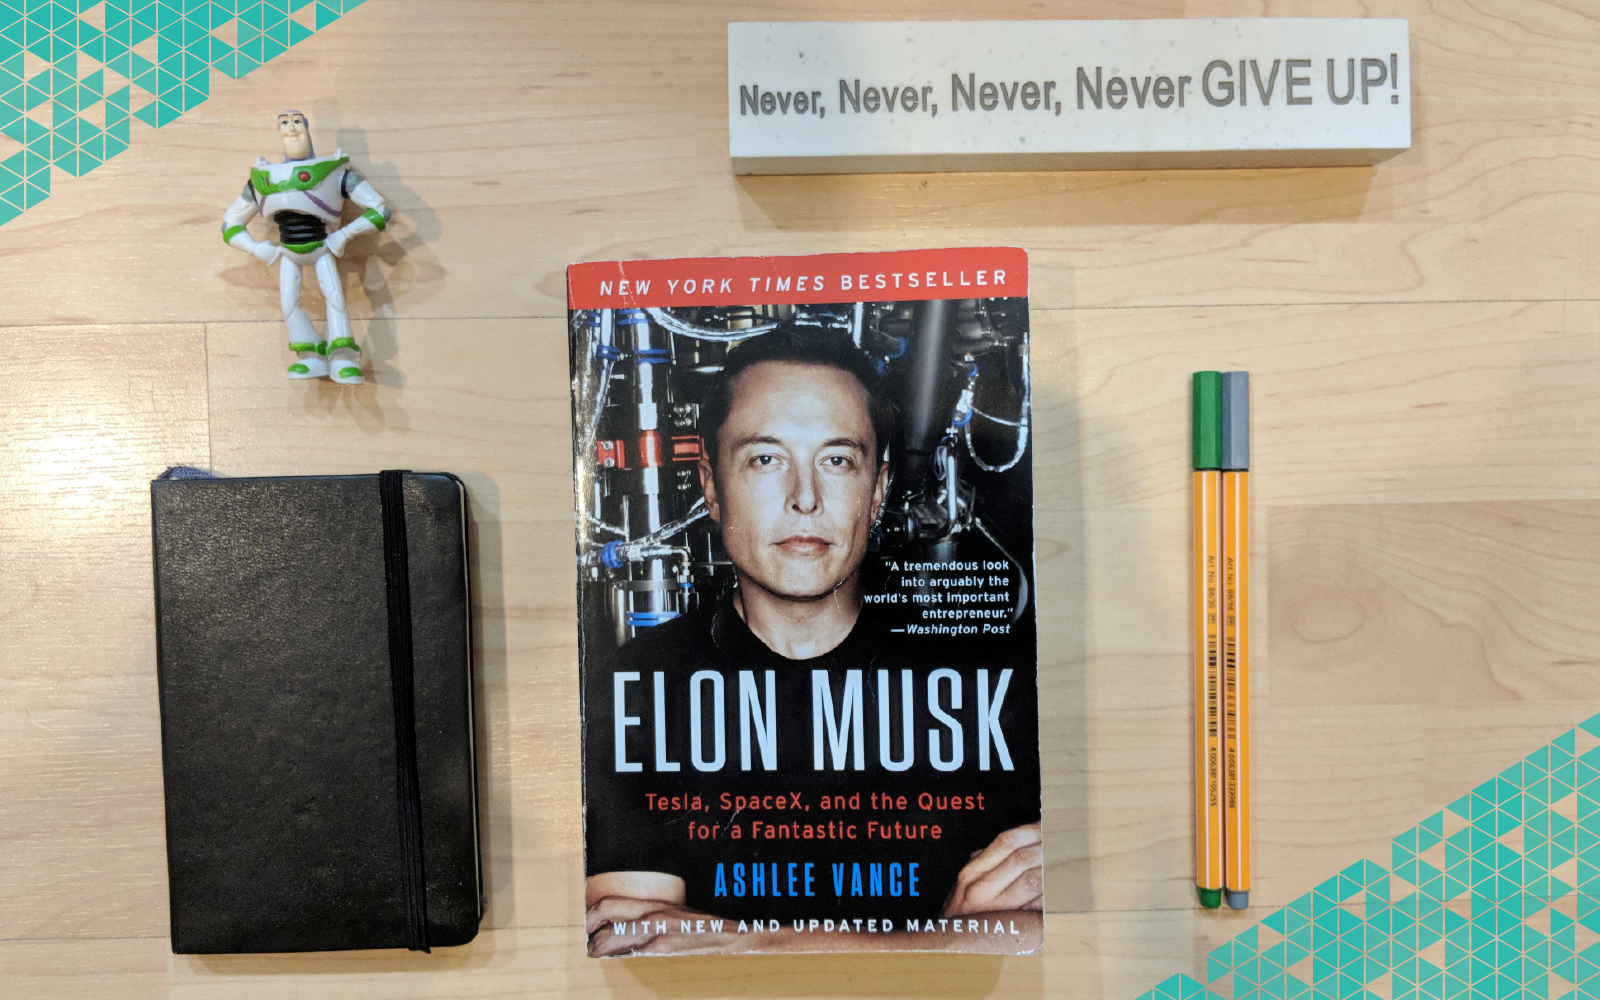 Elon Musk Biography.png